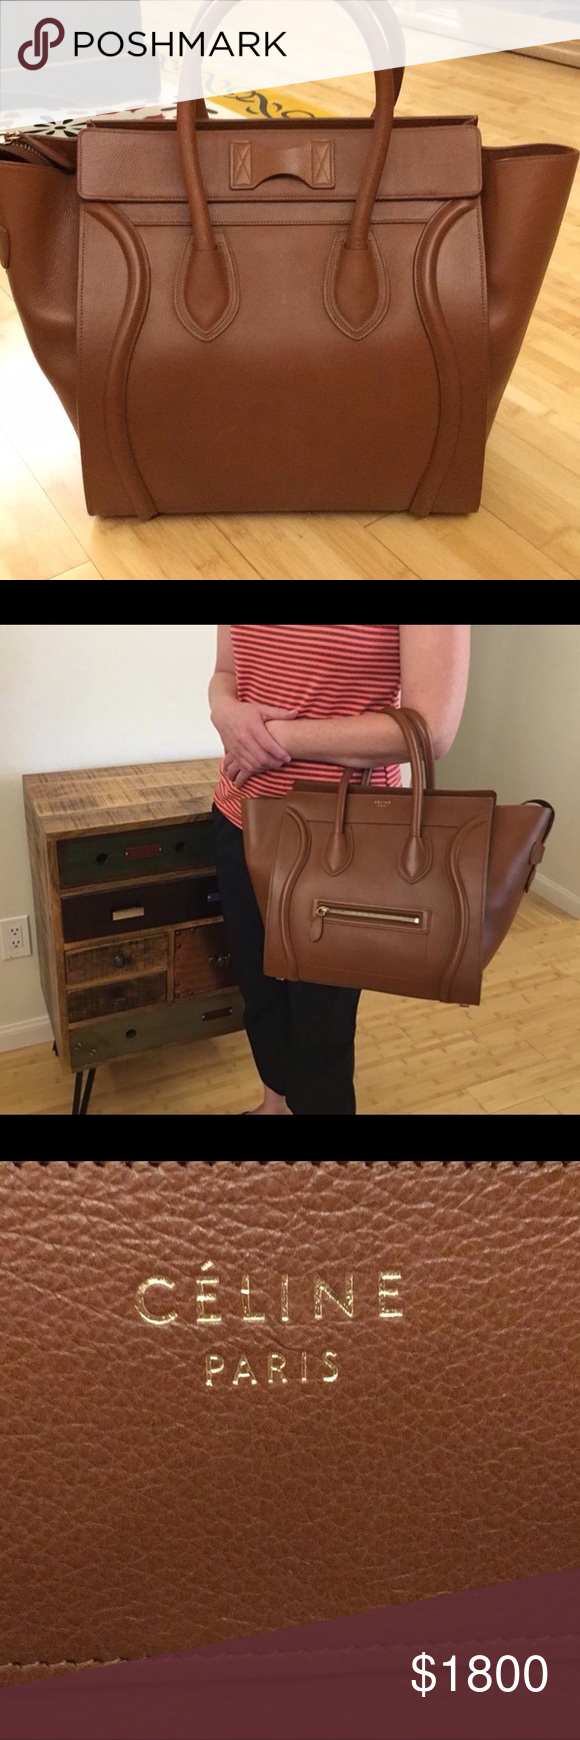 6f7367b3ee Céline Micro Luggage Brown Leather Travel Bag CELINE CARAMEL BROWN BABY  CALFSKIN LEATHER MINI LUGGAGE BAG